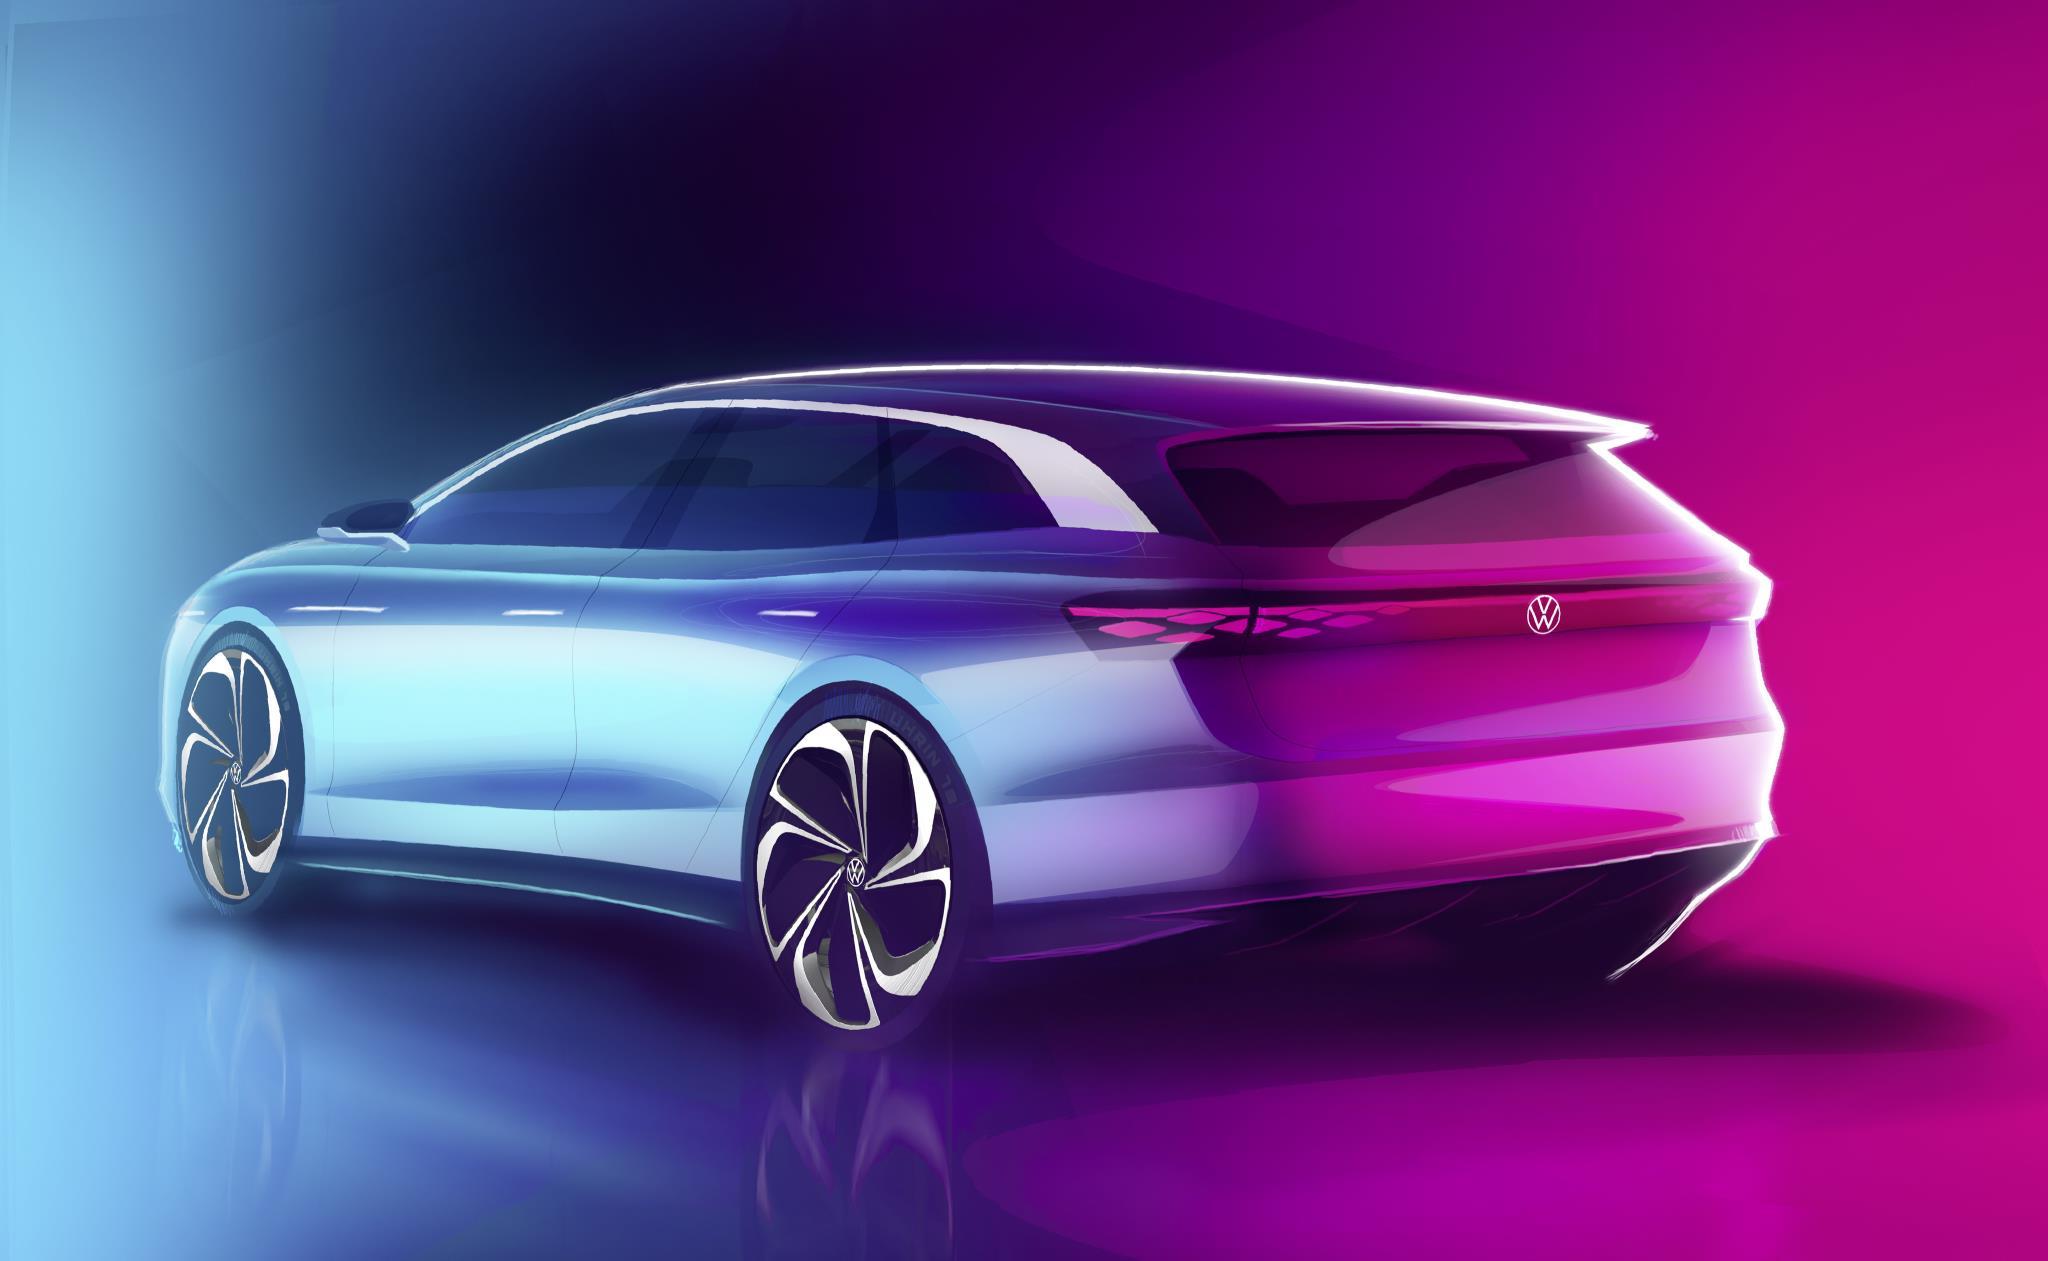 Desenho da Volkswagen Space Vizzion de traseira mostra o filete de LEDs que percorre a tampa do porta-malas